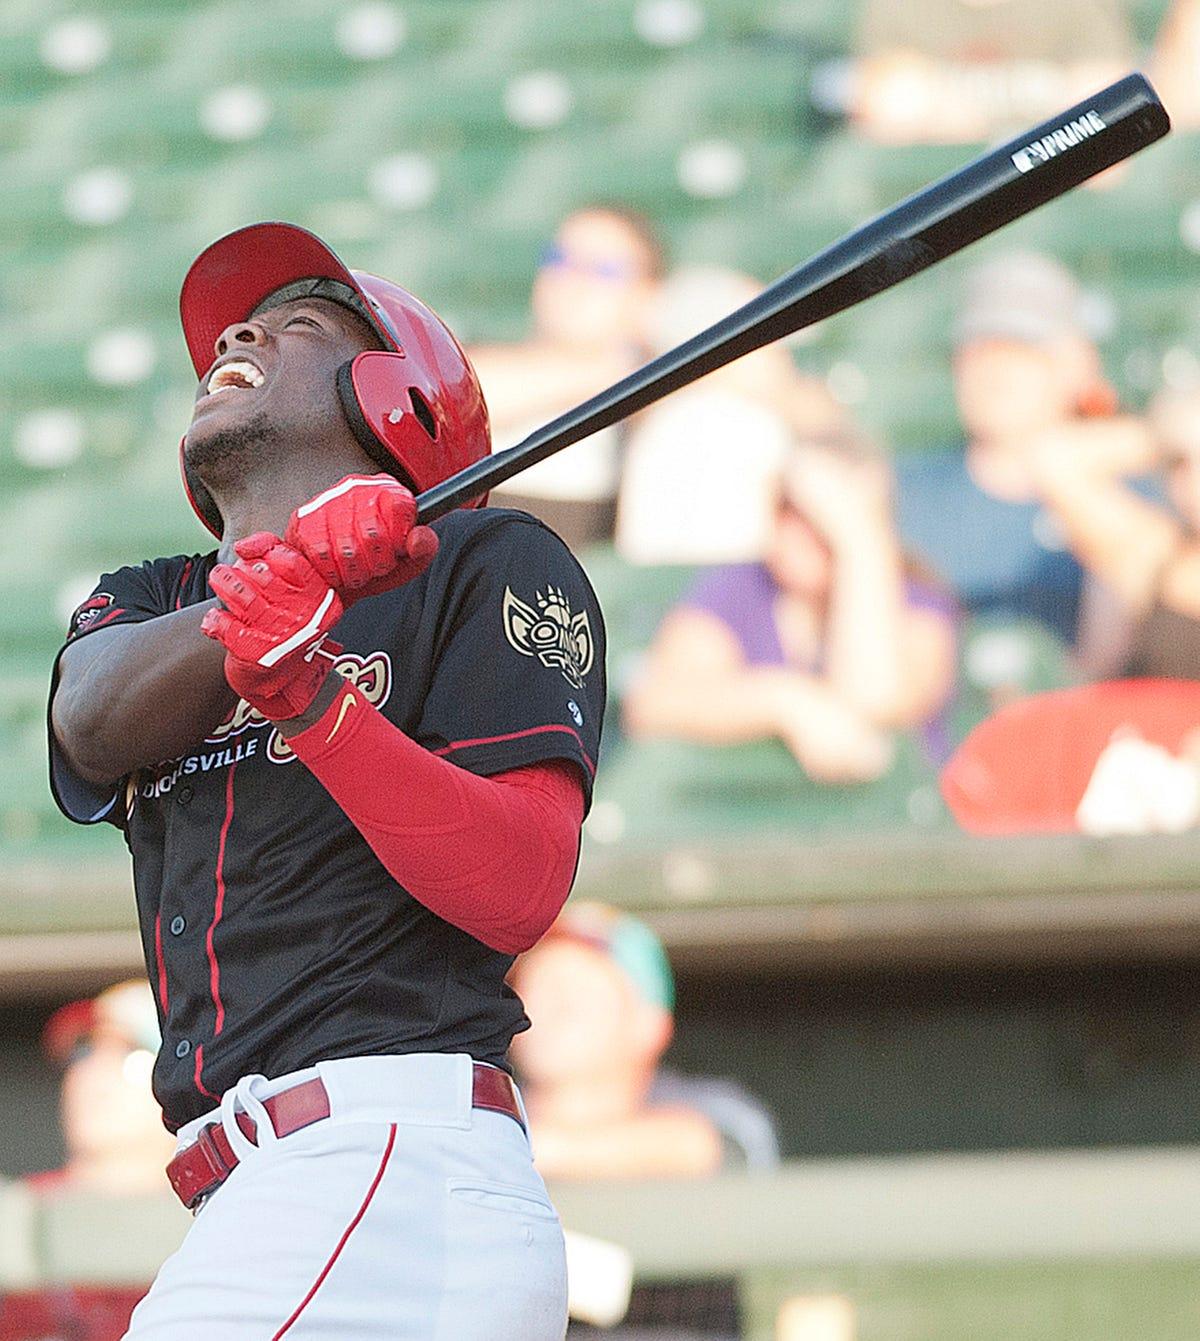 Cincinnati Reds: Louisville Bats own worst record in Triple